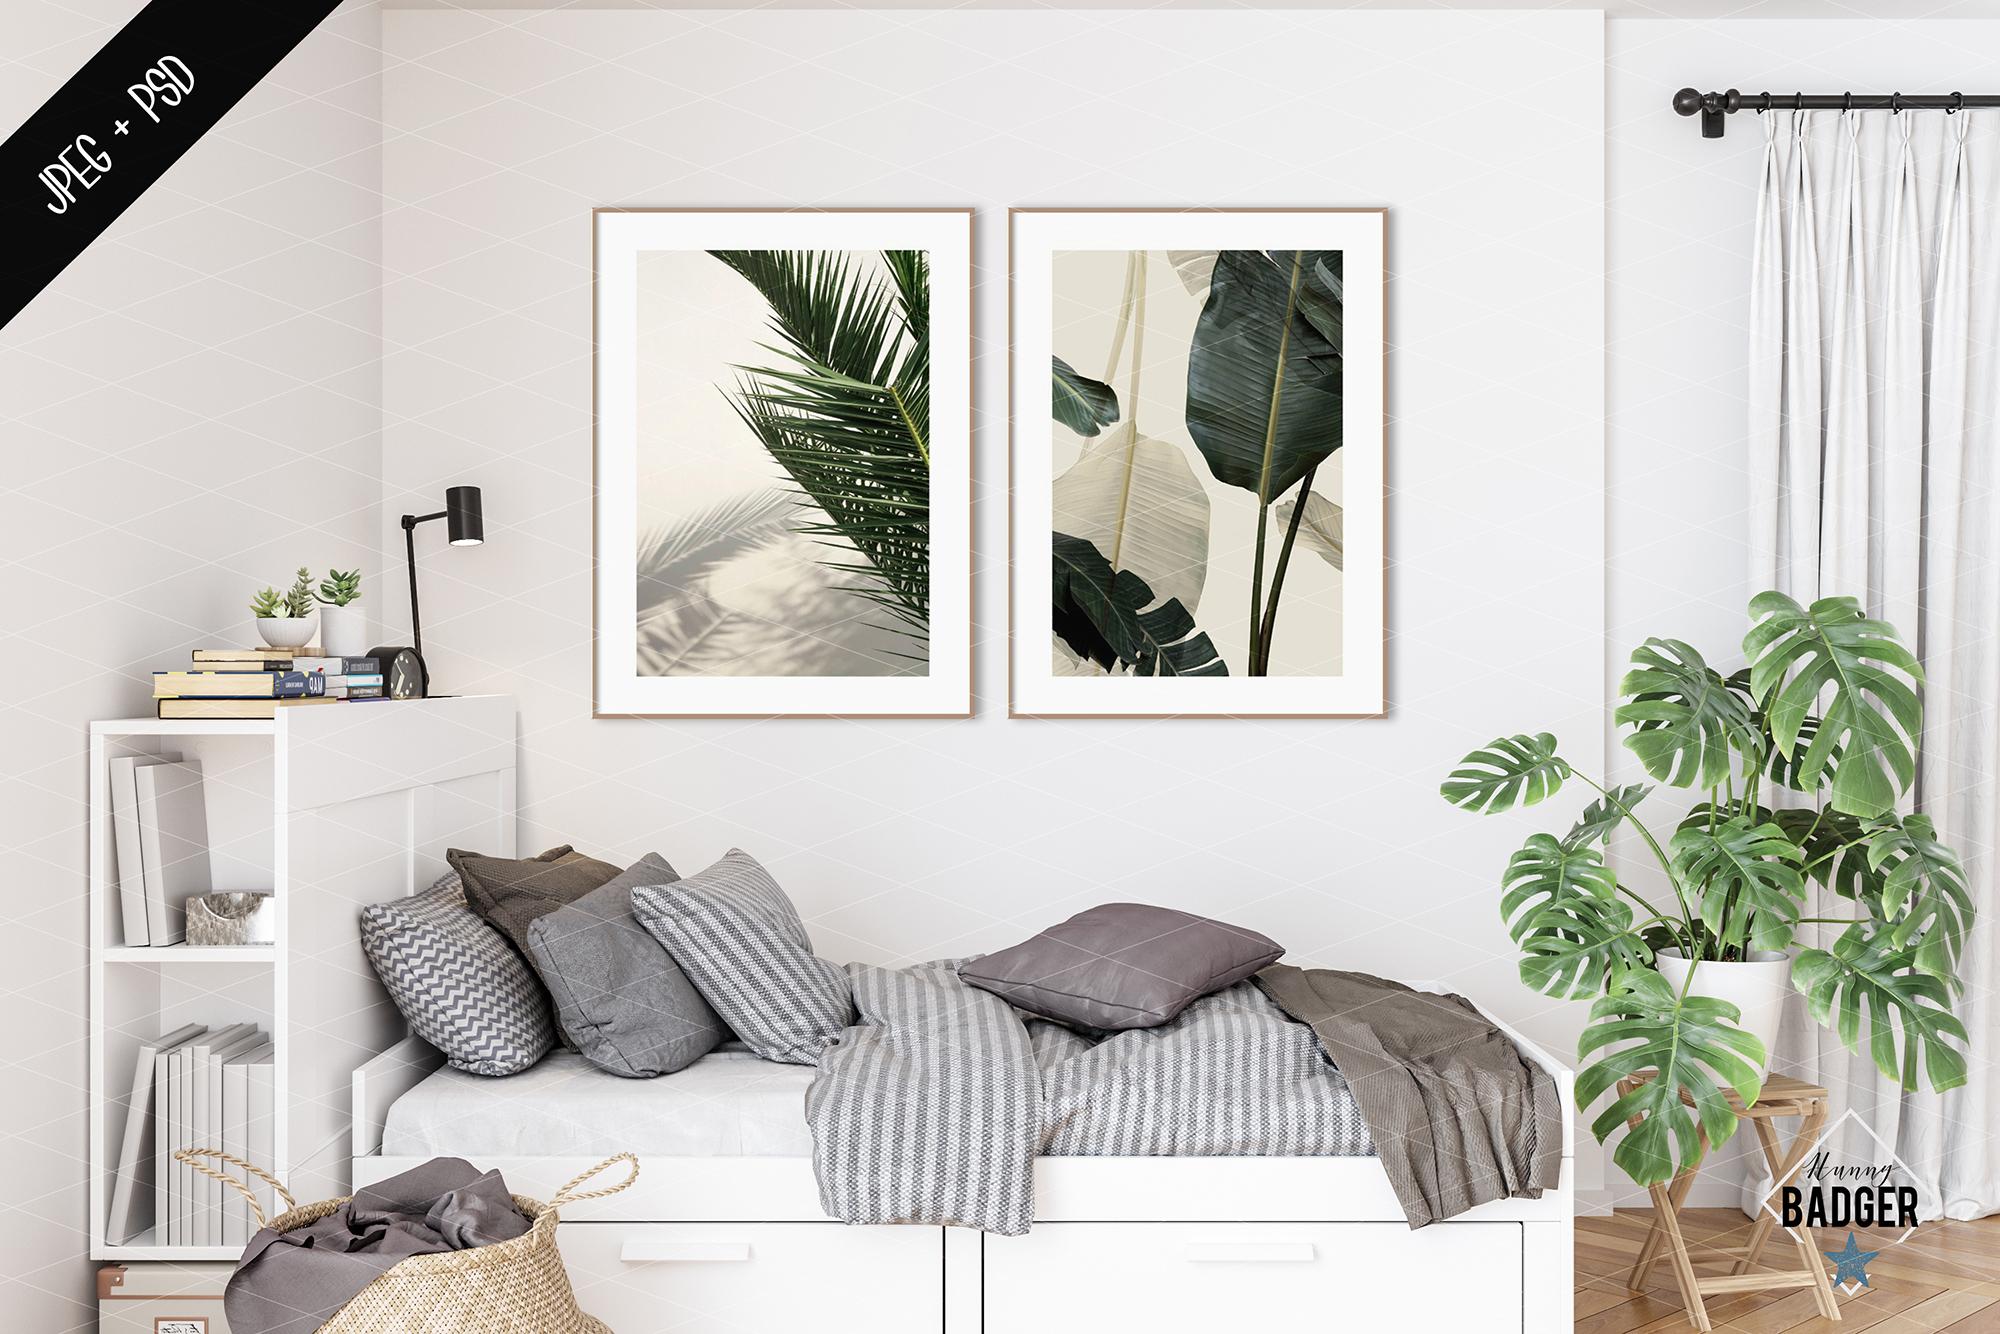 Interior mockup BUNDLE - frame & wall mockup creator example image 12